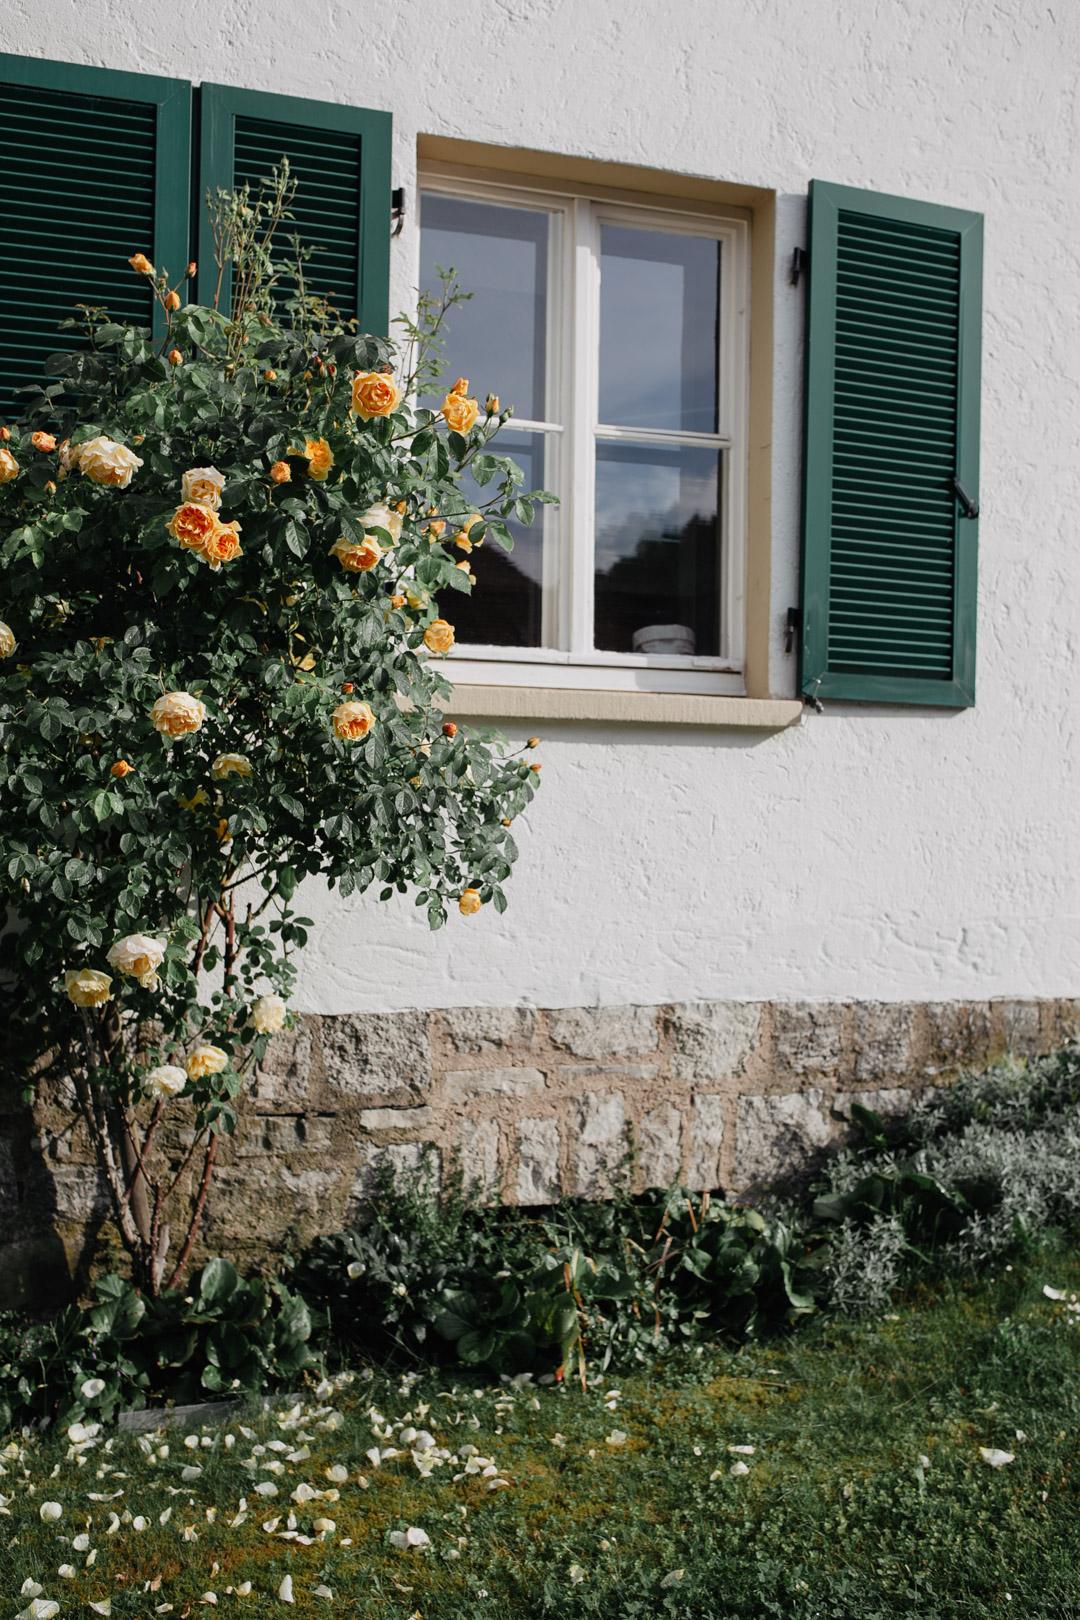 Ausflugtipps Franken // Pieces of Mariposa - Lifestyle Blog aus Nürnberg